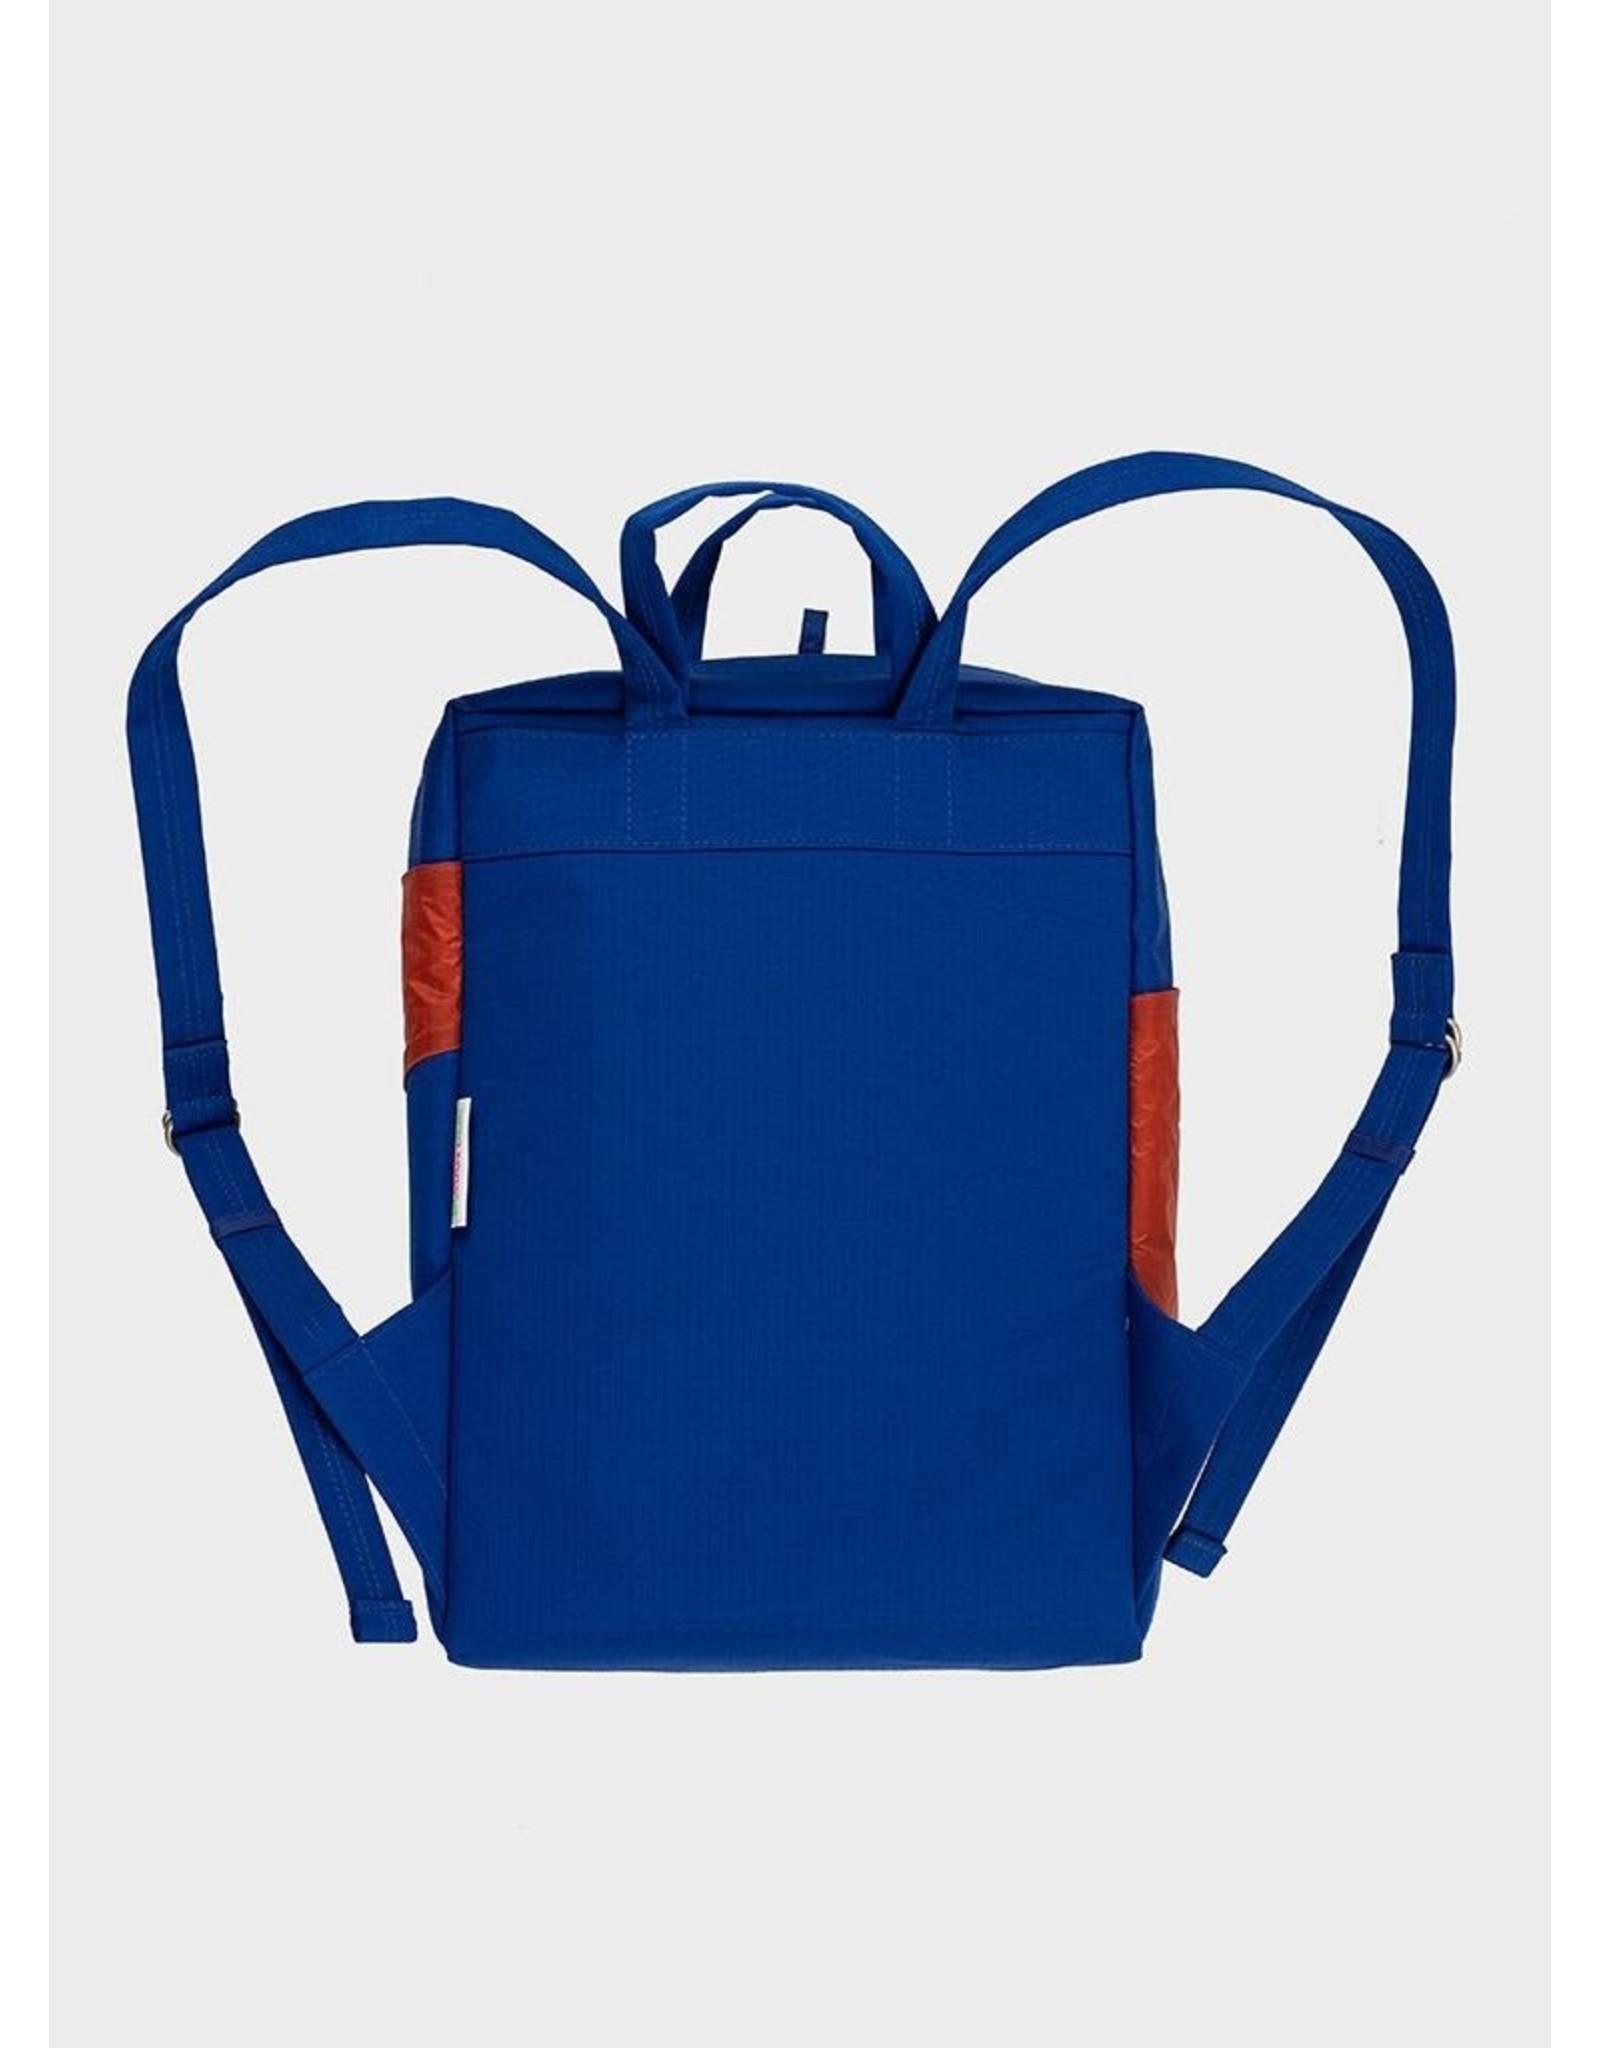 Susan Bijl Susan Bijl Backpack, Electric Blue & Rust